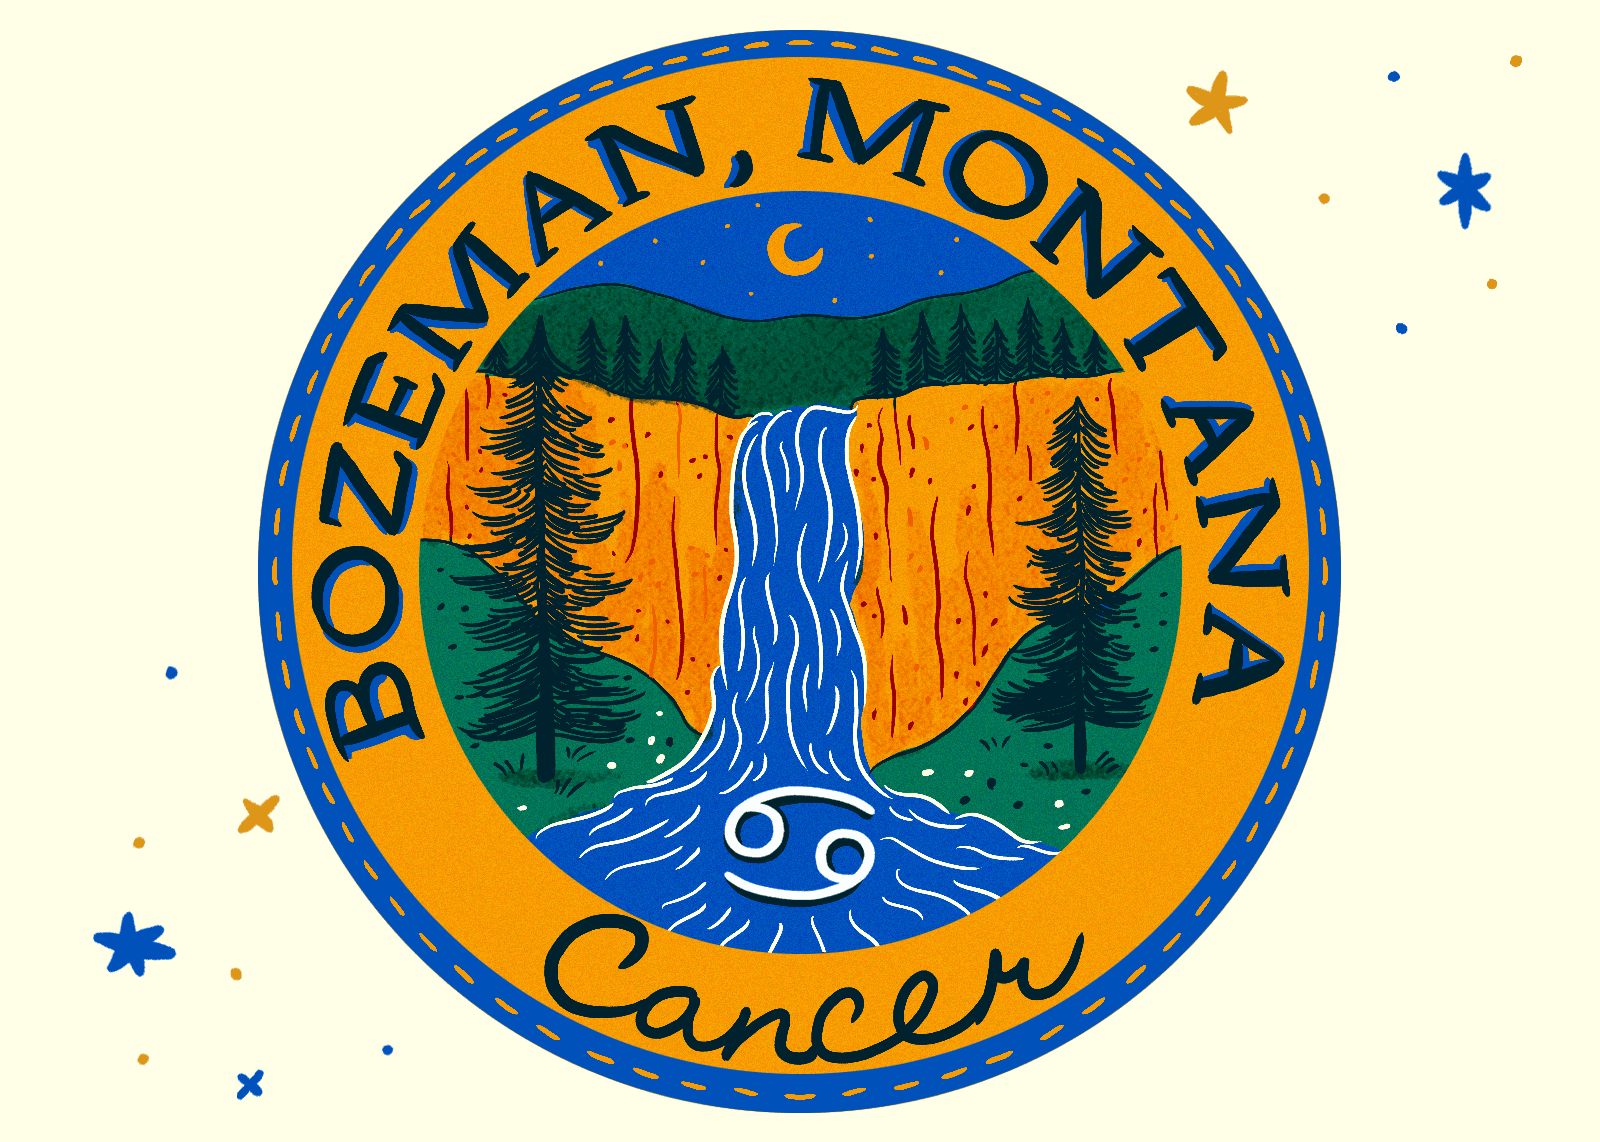 Illustration of Bozeman, Montana